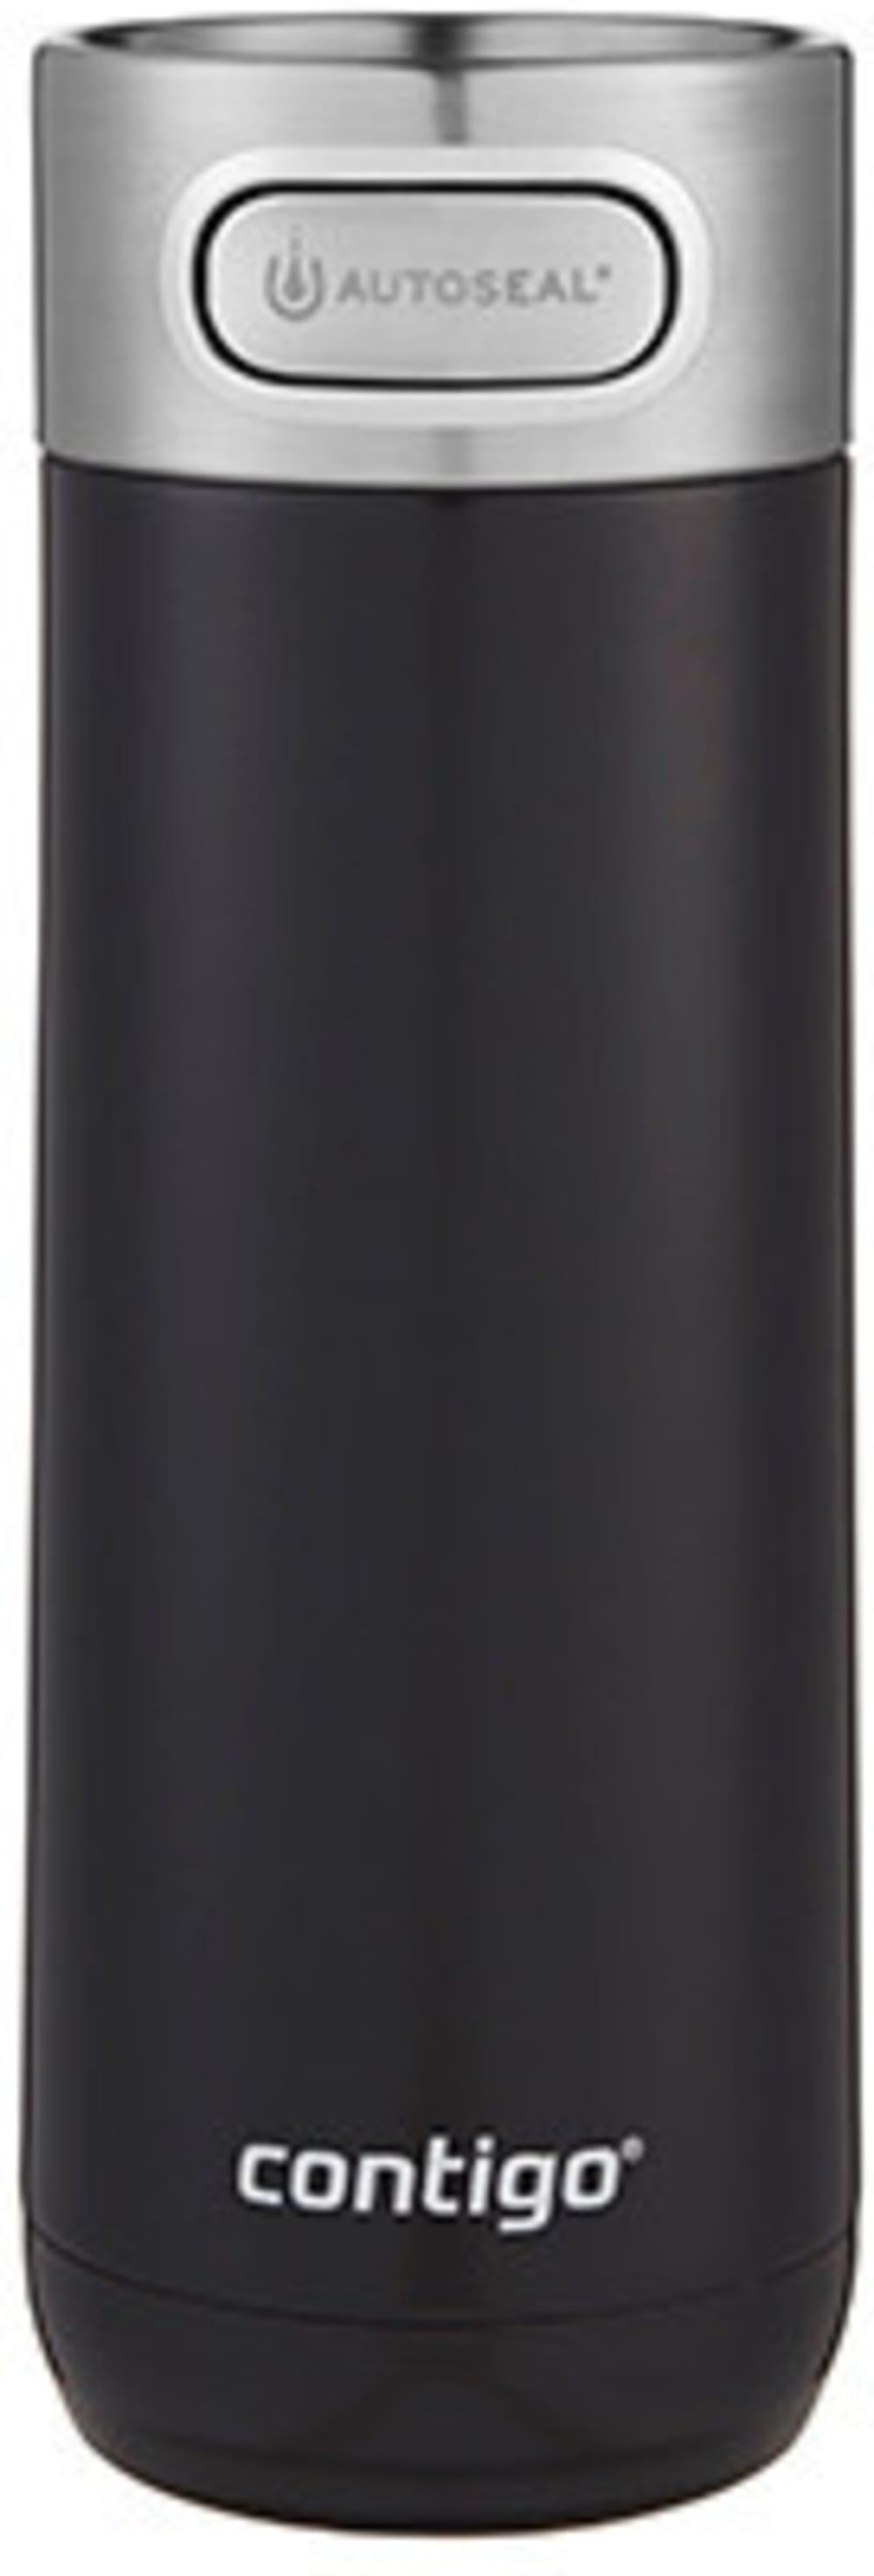 Kubek termiczny Luxe Vacuum Insulated Autoseal licorice 470 ml